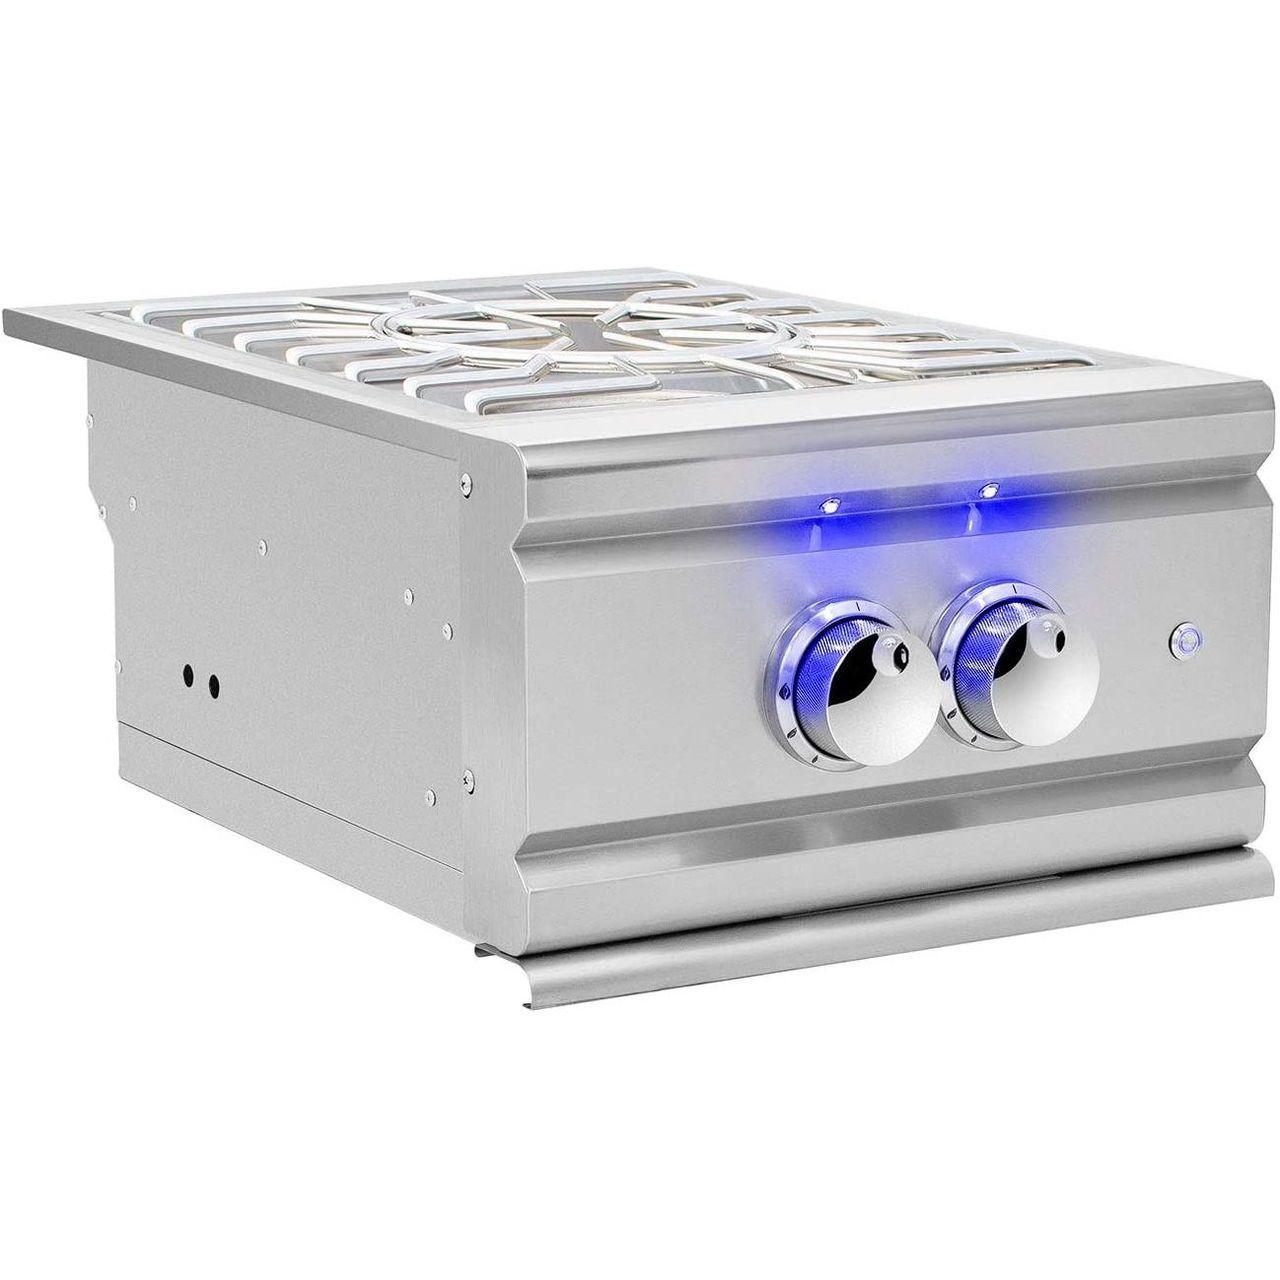 Summerset TRL Series Power Burner - Liquid Propane